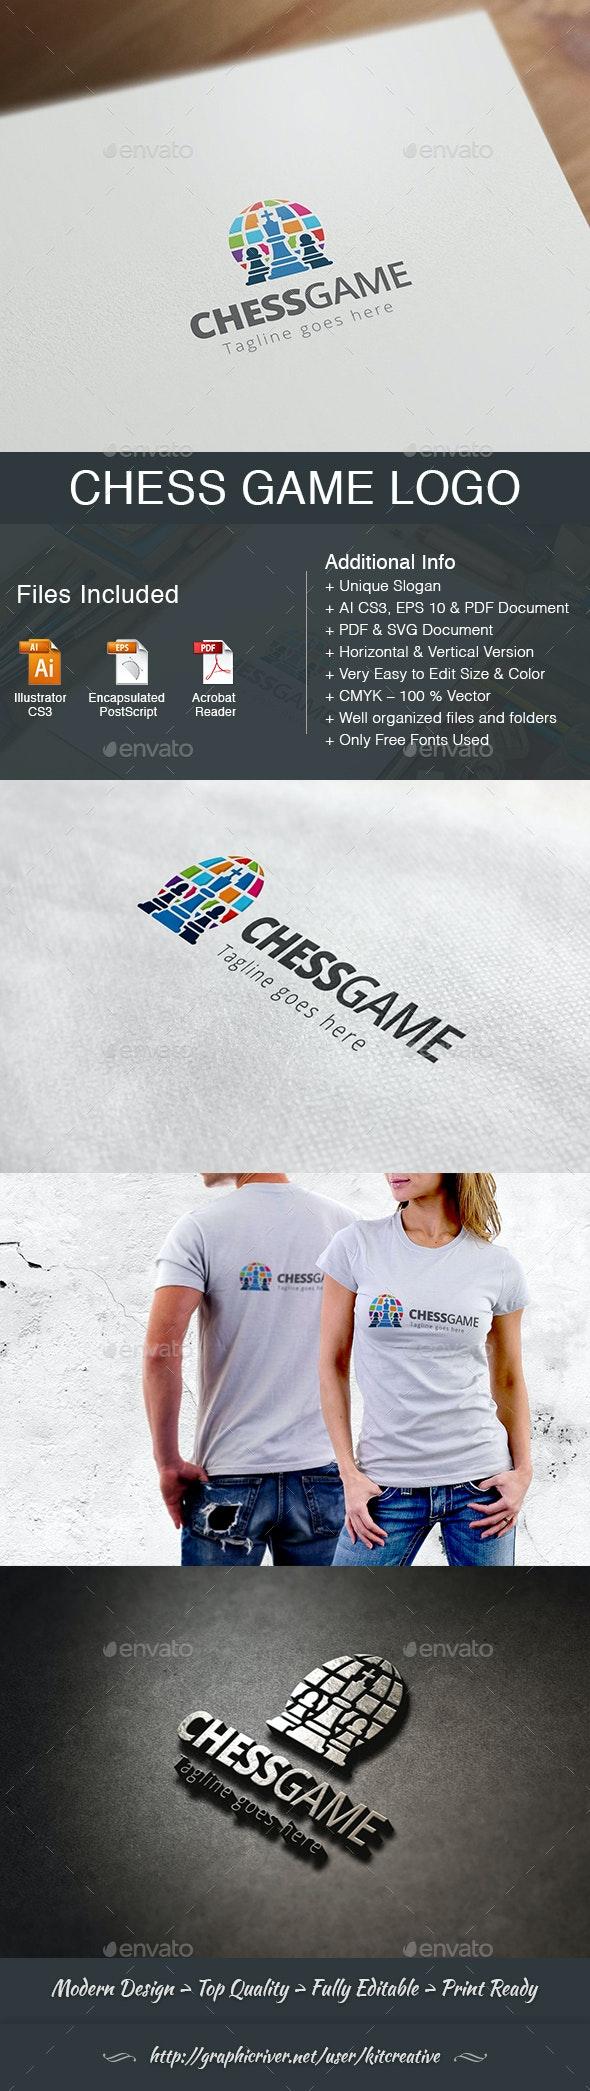 Chess Game Logo